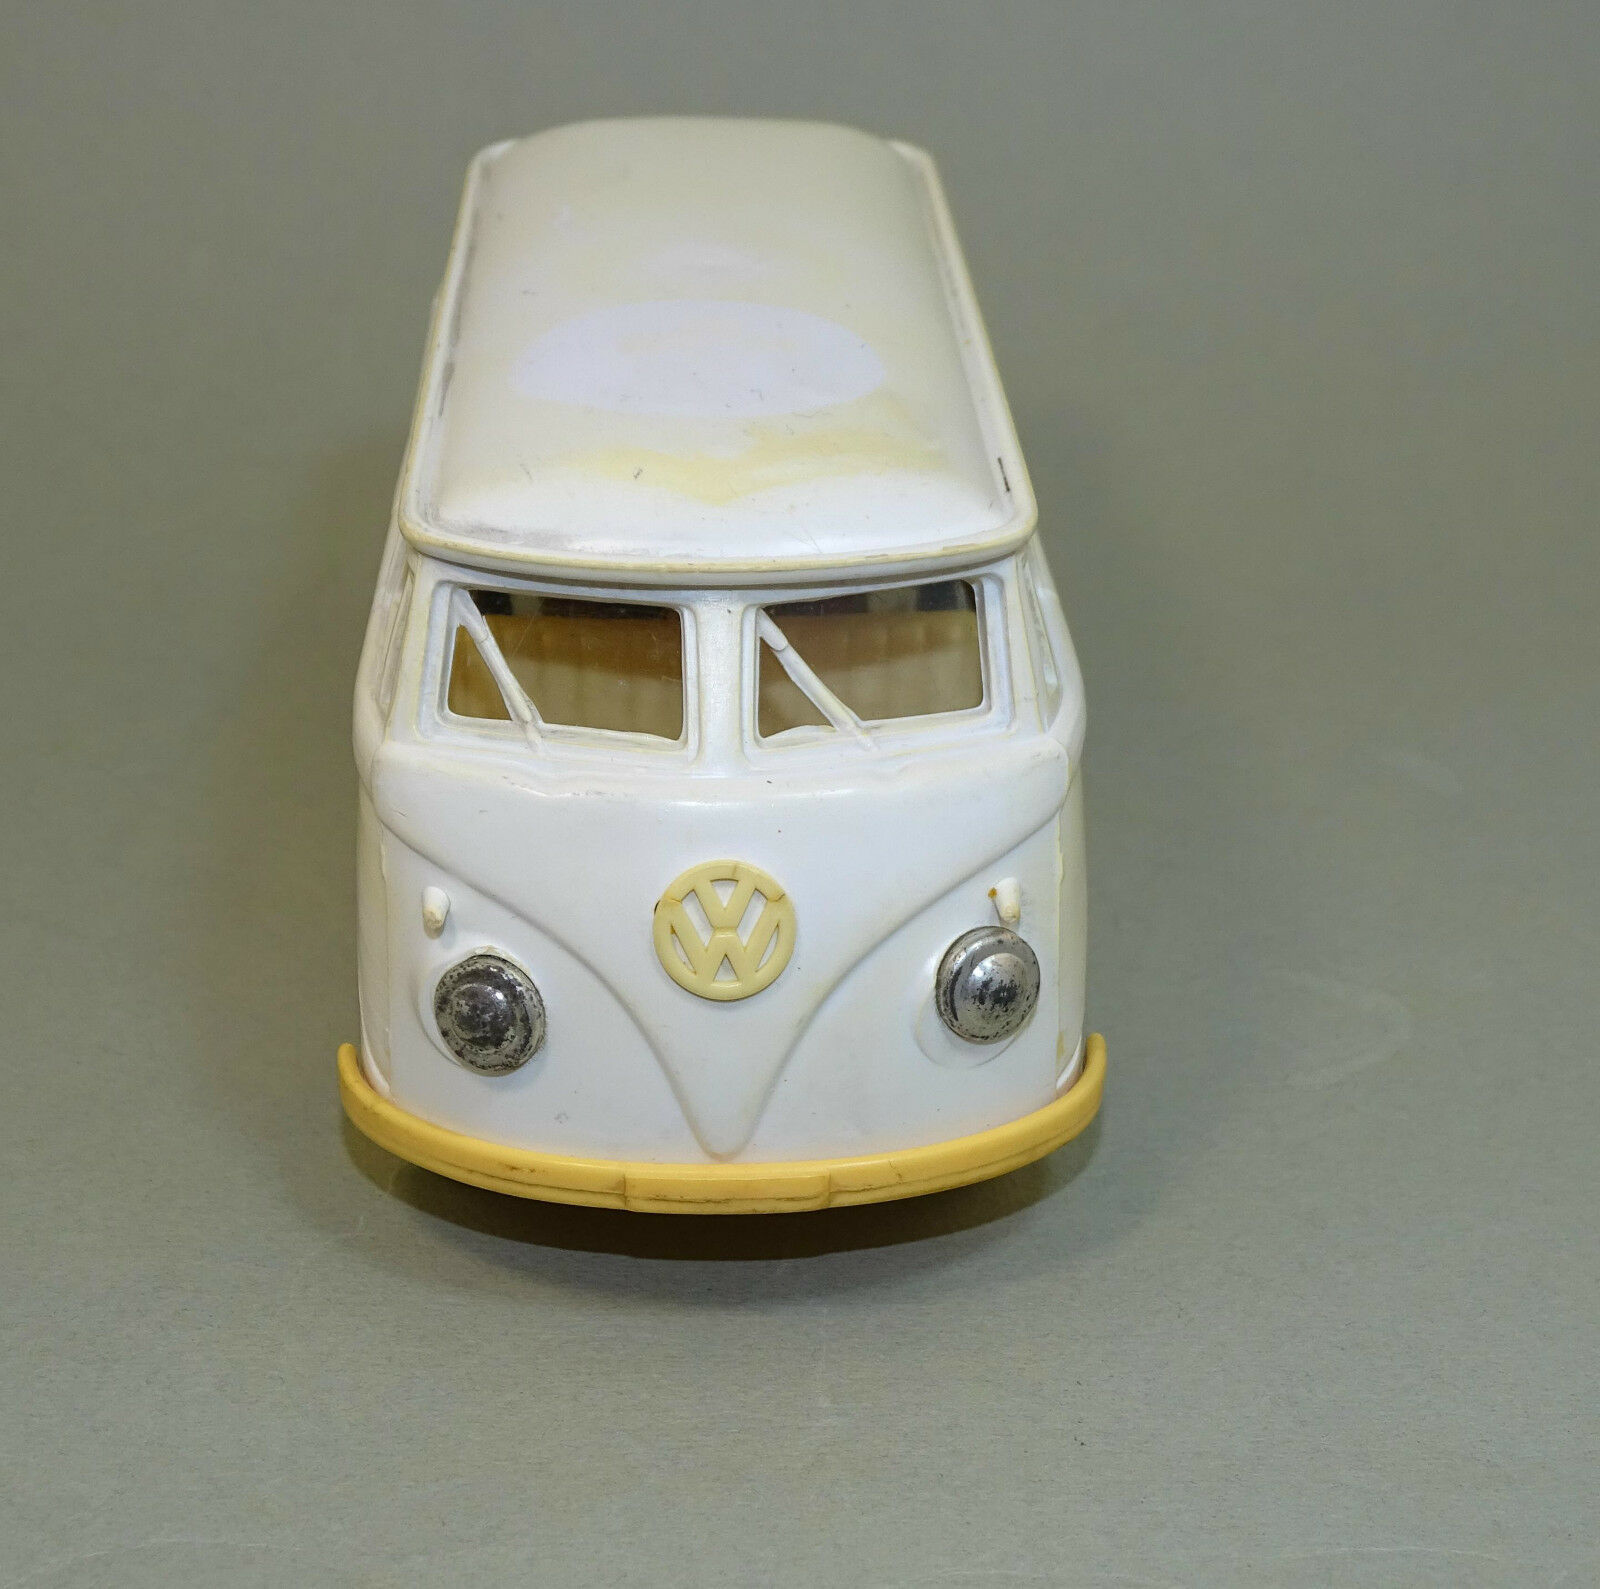 Vintage Ambulance Volkswagen VW T1 Bus Van Toy Car Car Car Hungary 1970s d602e5